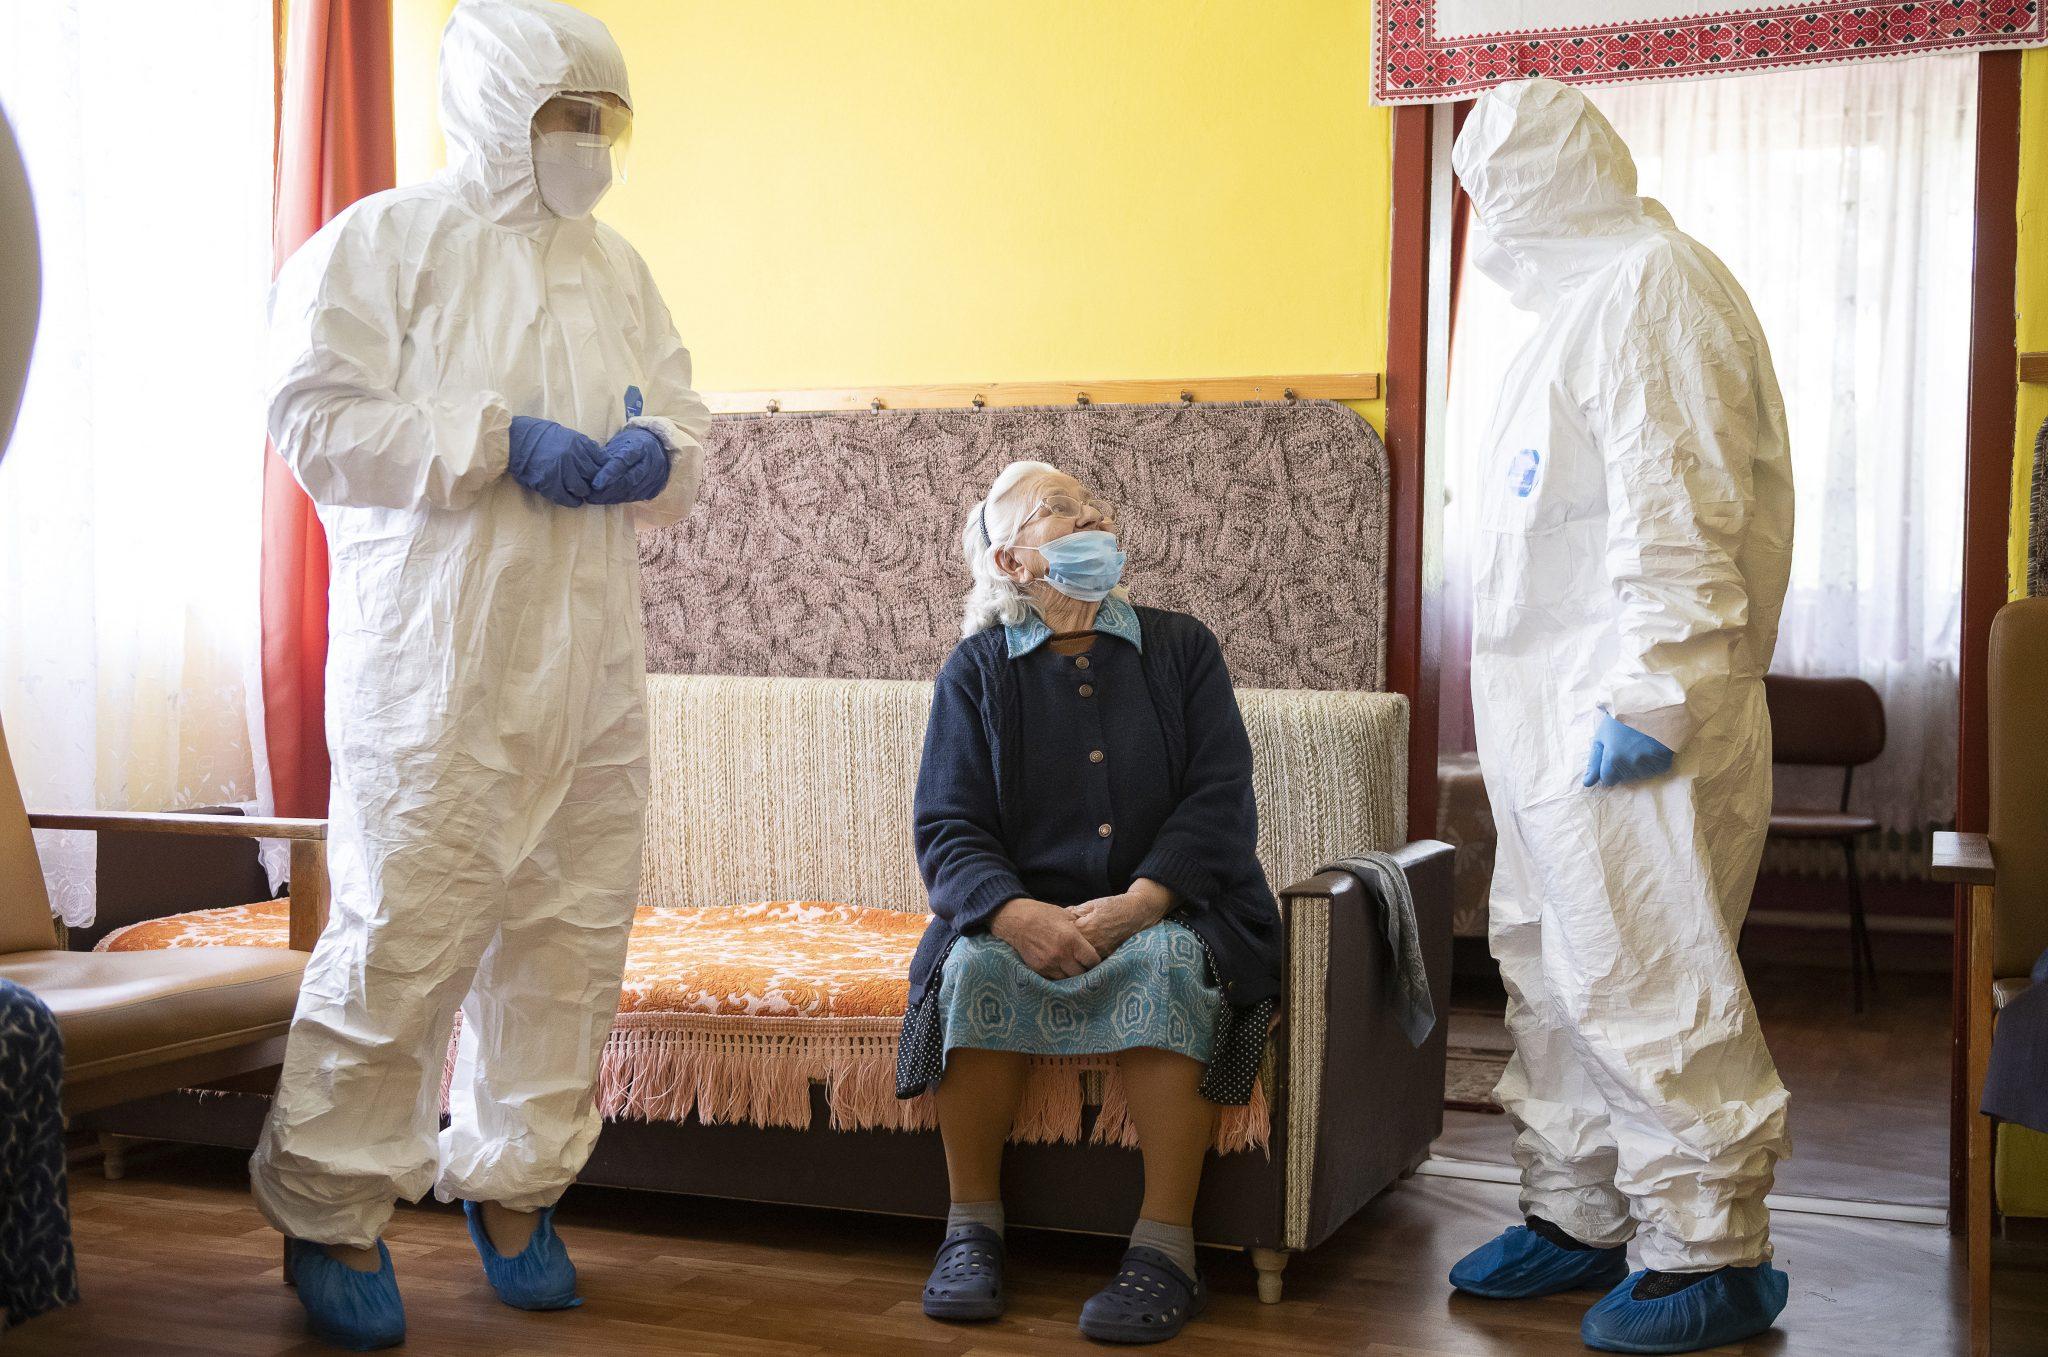 Coronavirus Appears in Increasing Number of Social Care Homes